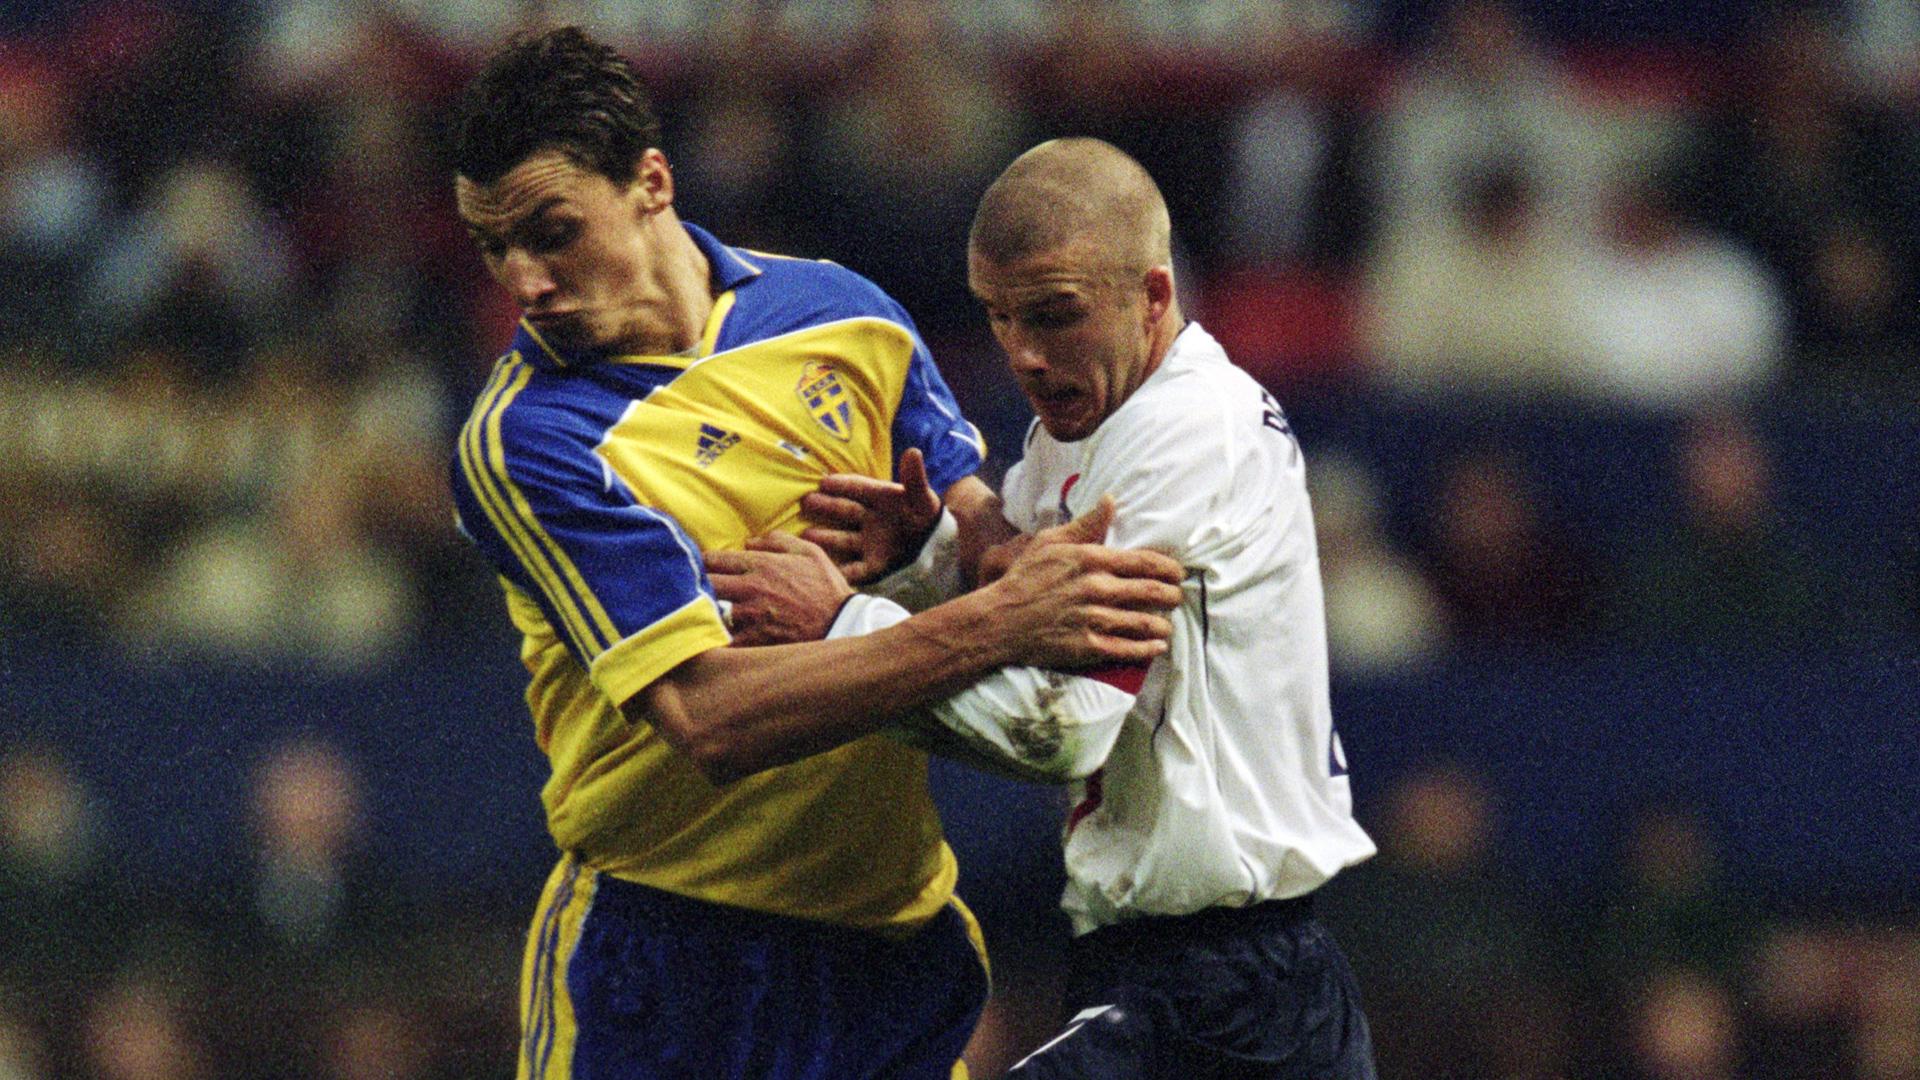 Ibrahimovic startet kuriosen Wettstreit mit David Beckham